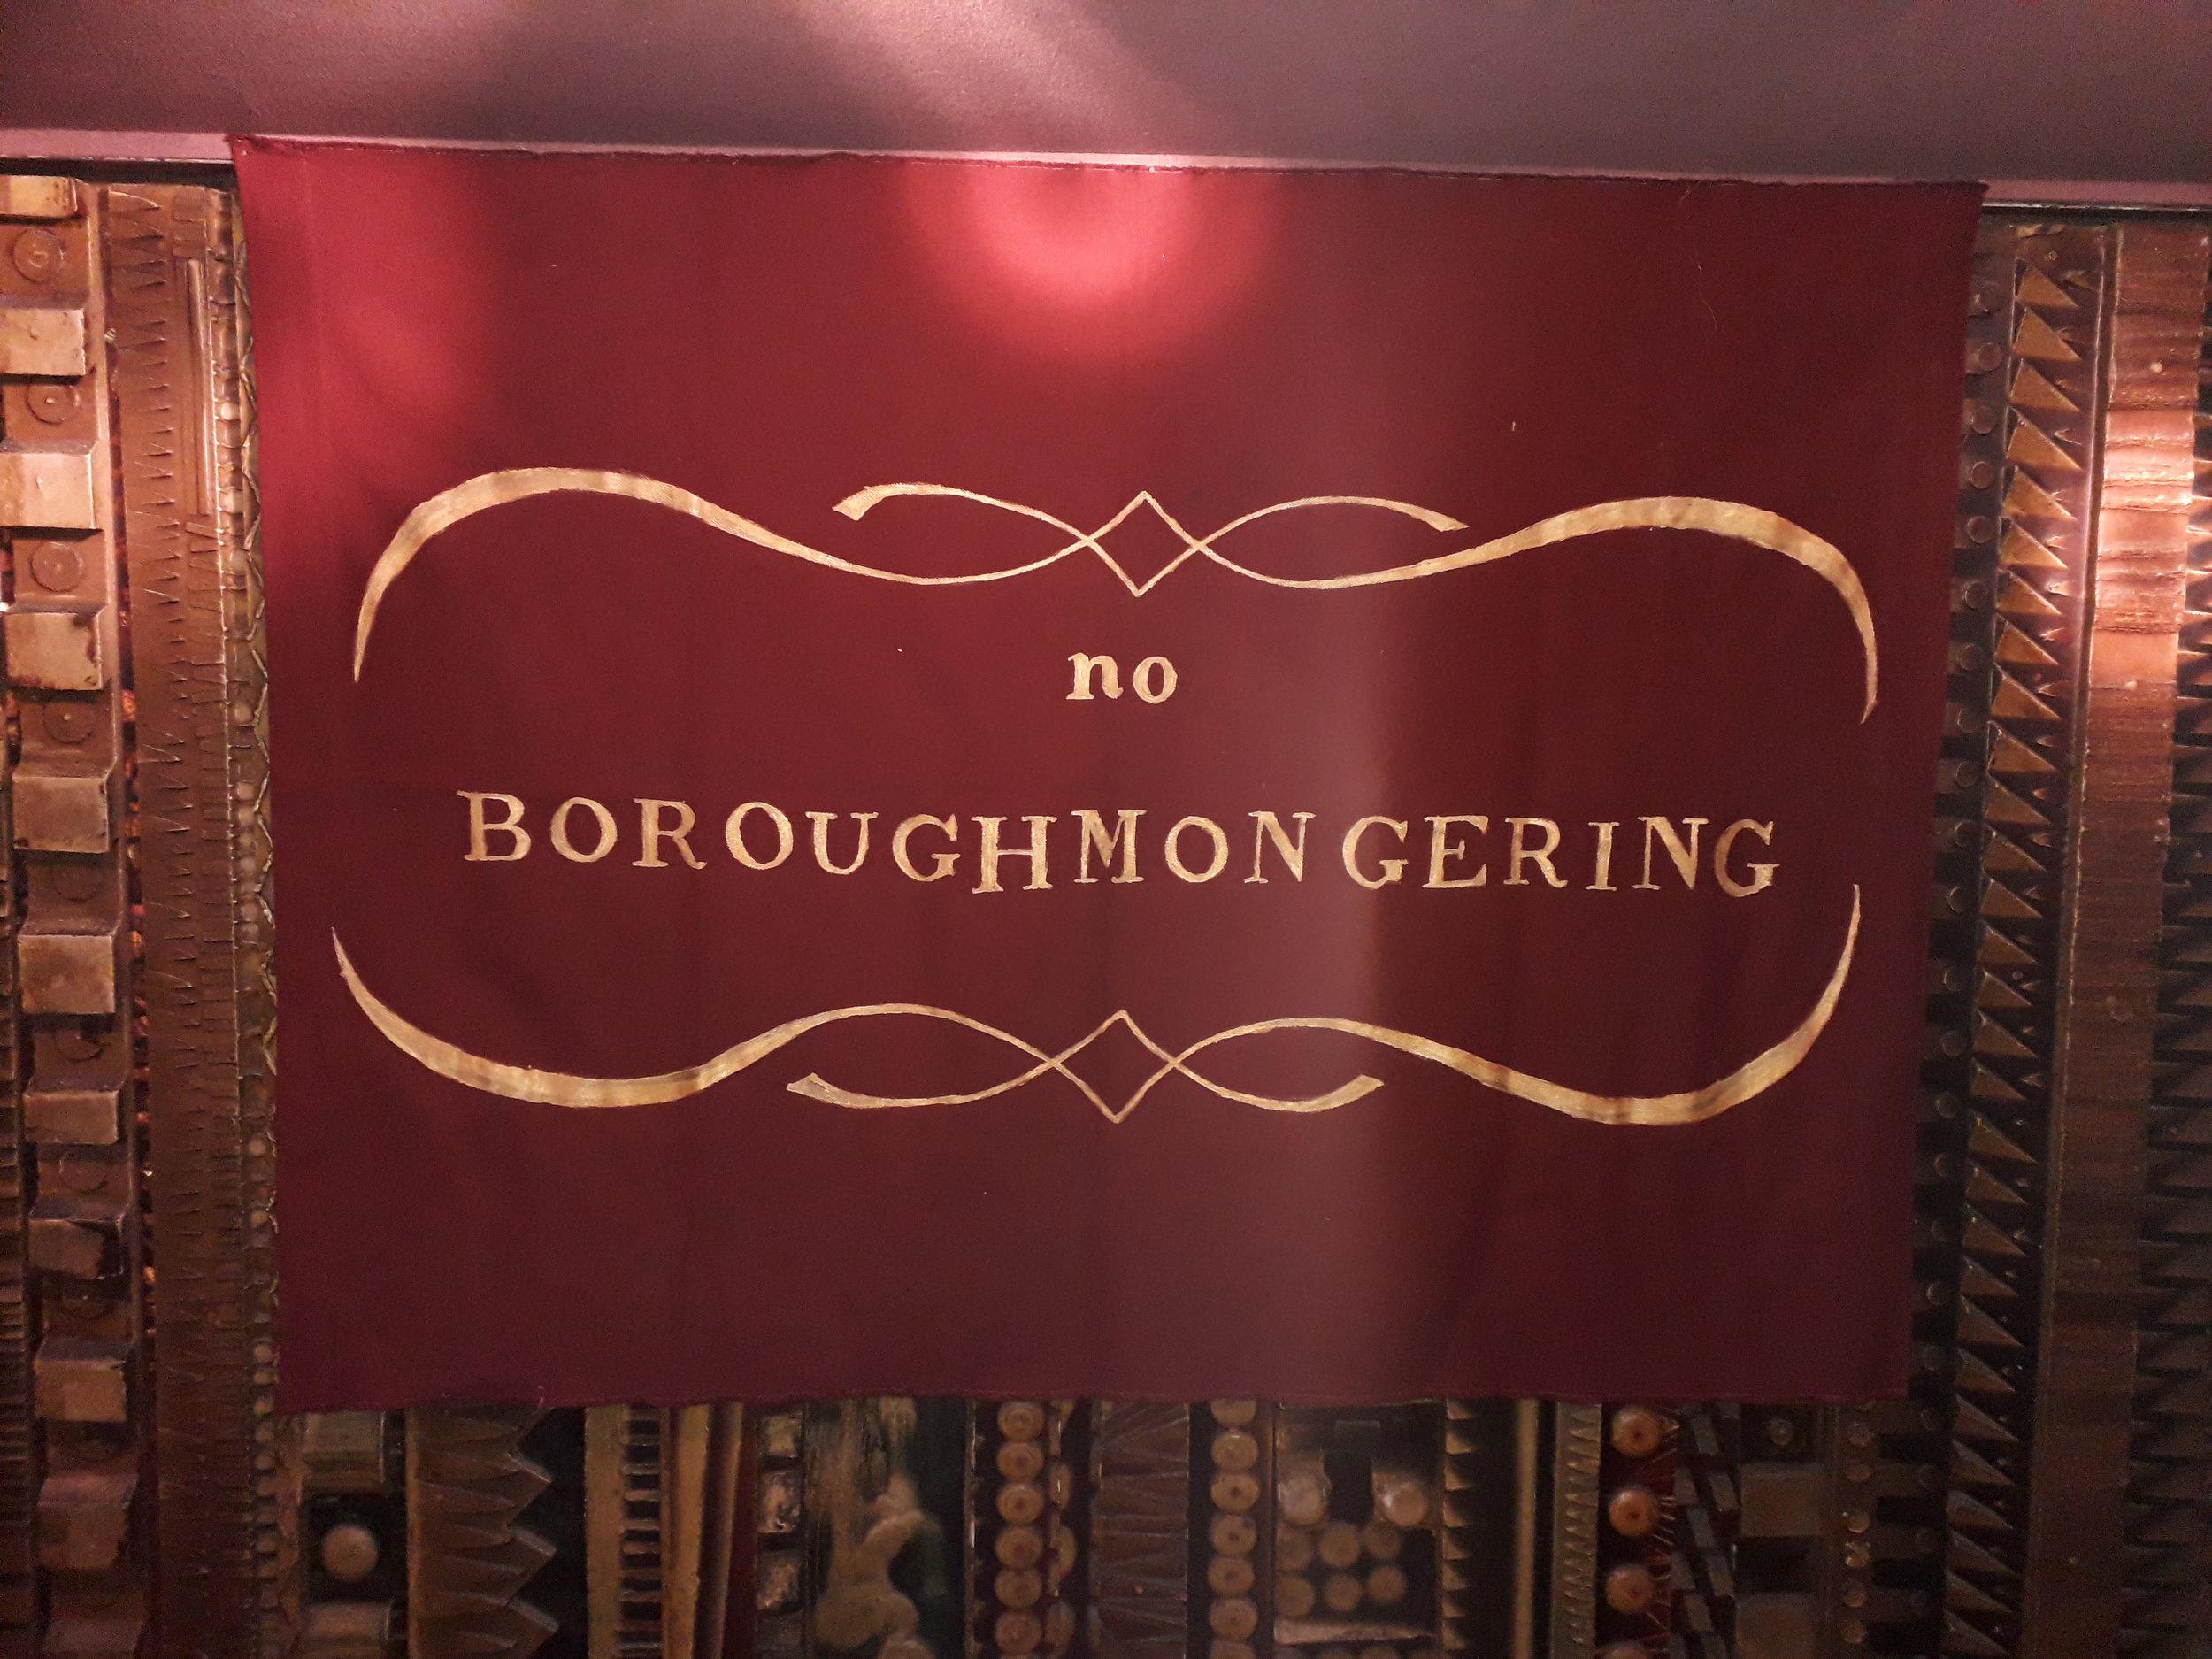 """No Boroughmongering"" on display at Curzon Mayfair"